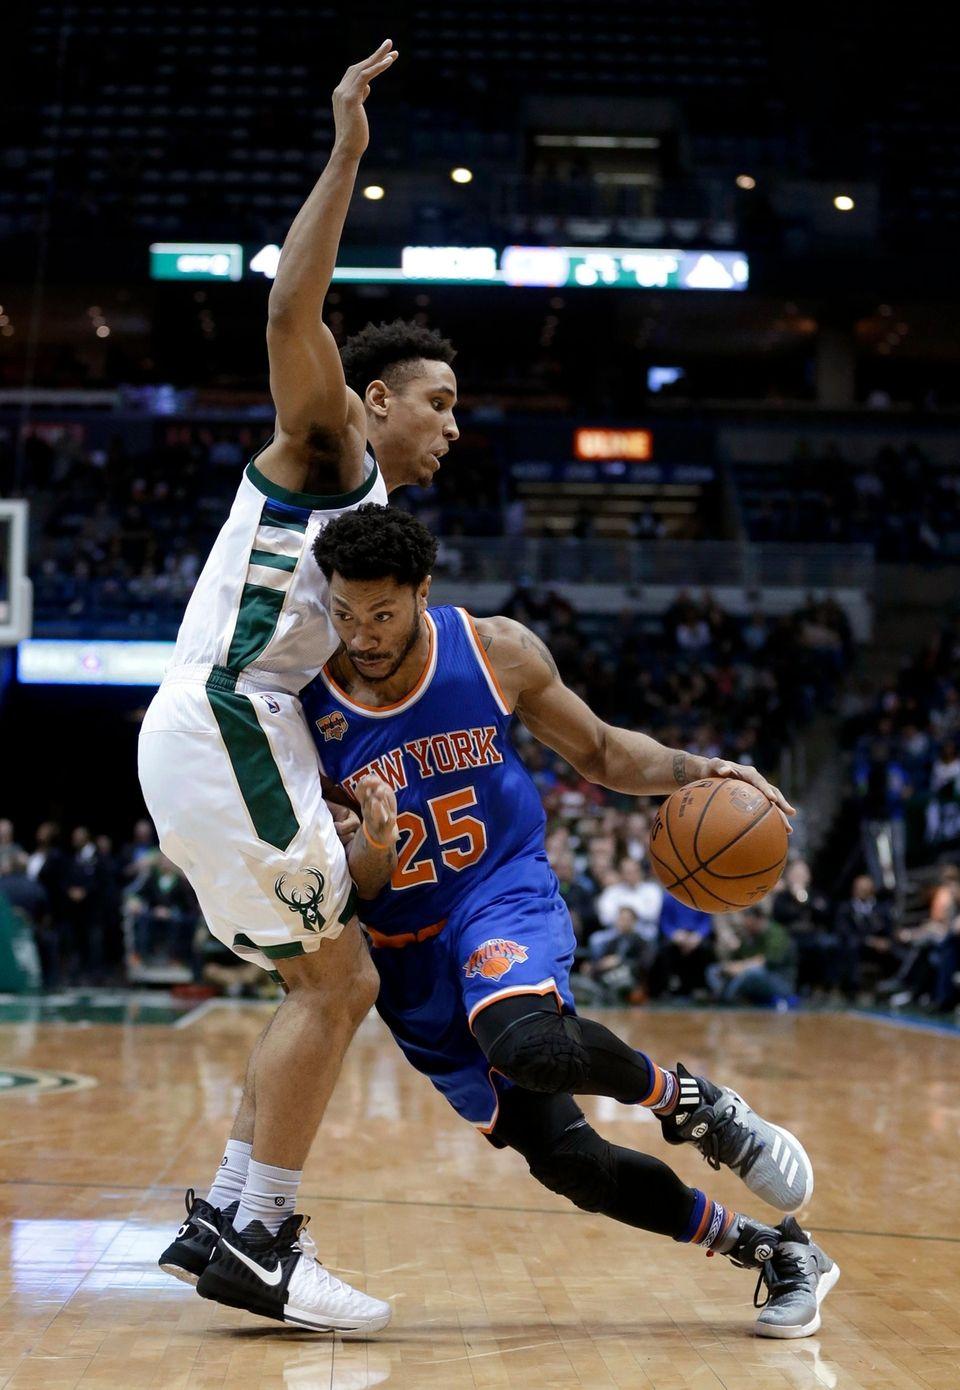 New York Knicks' Derrick Rose (25) drives to